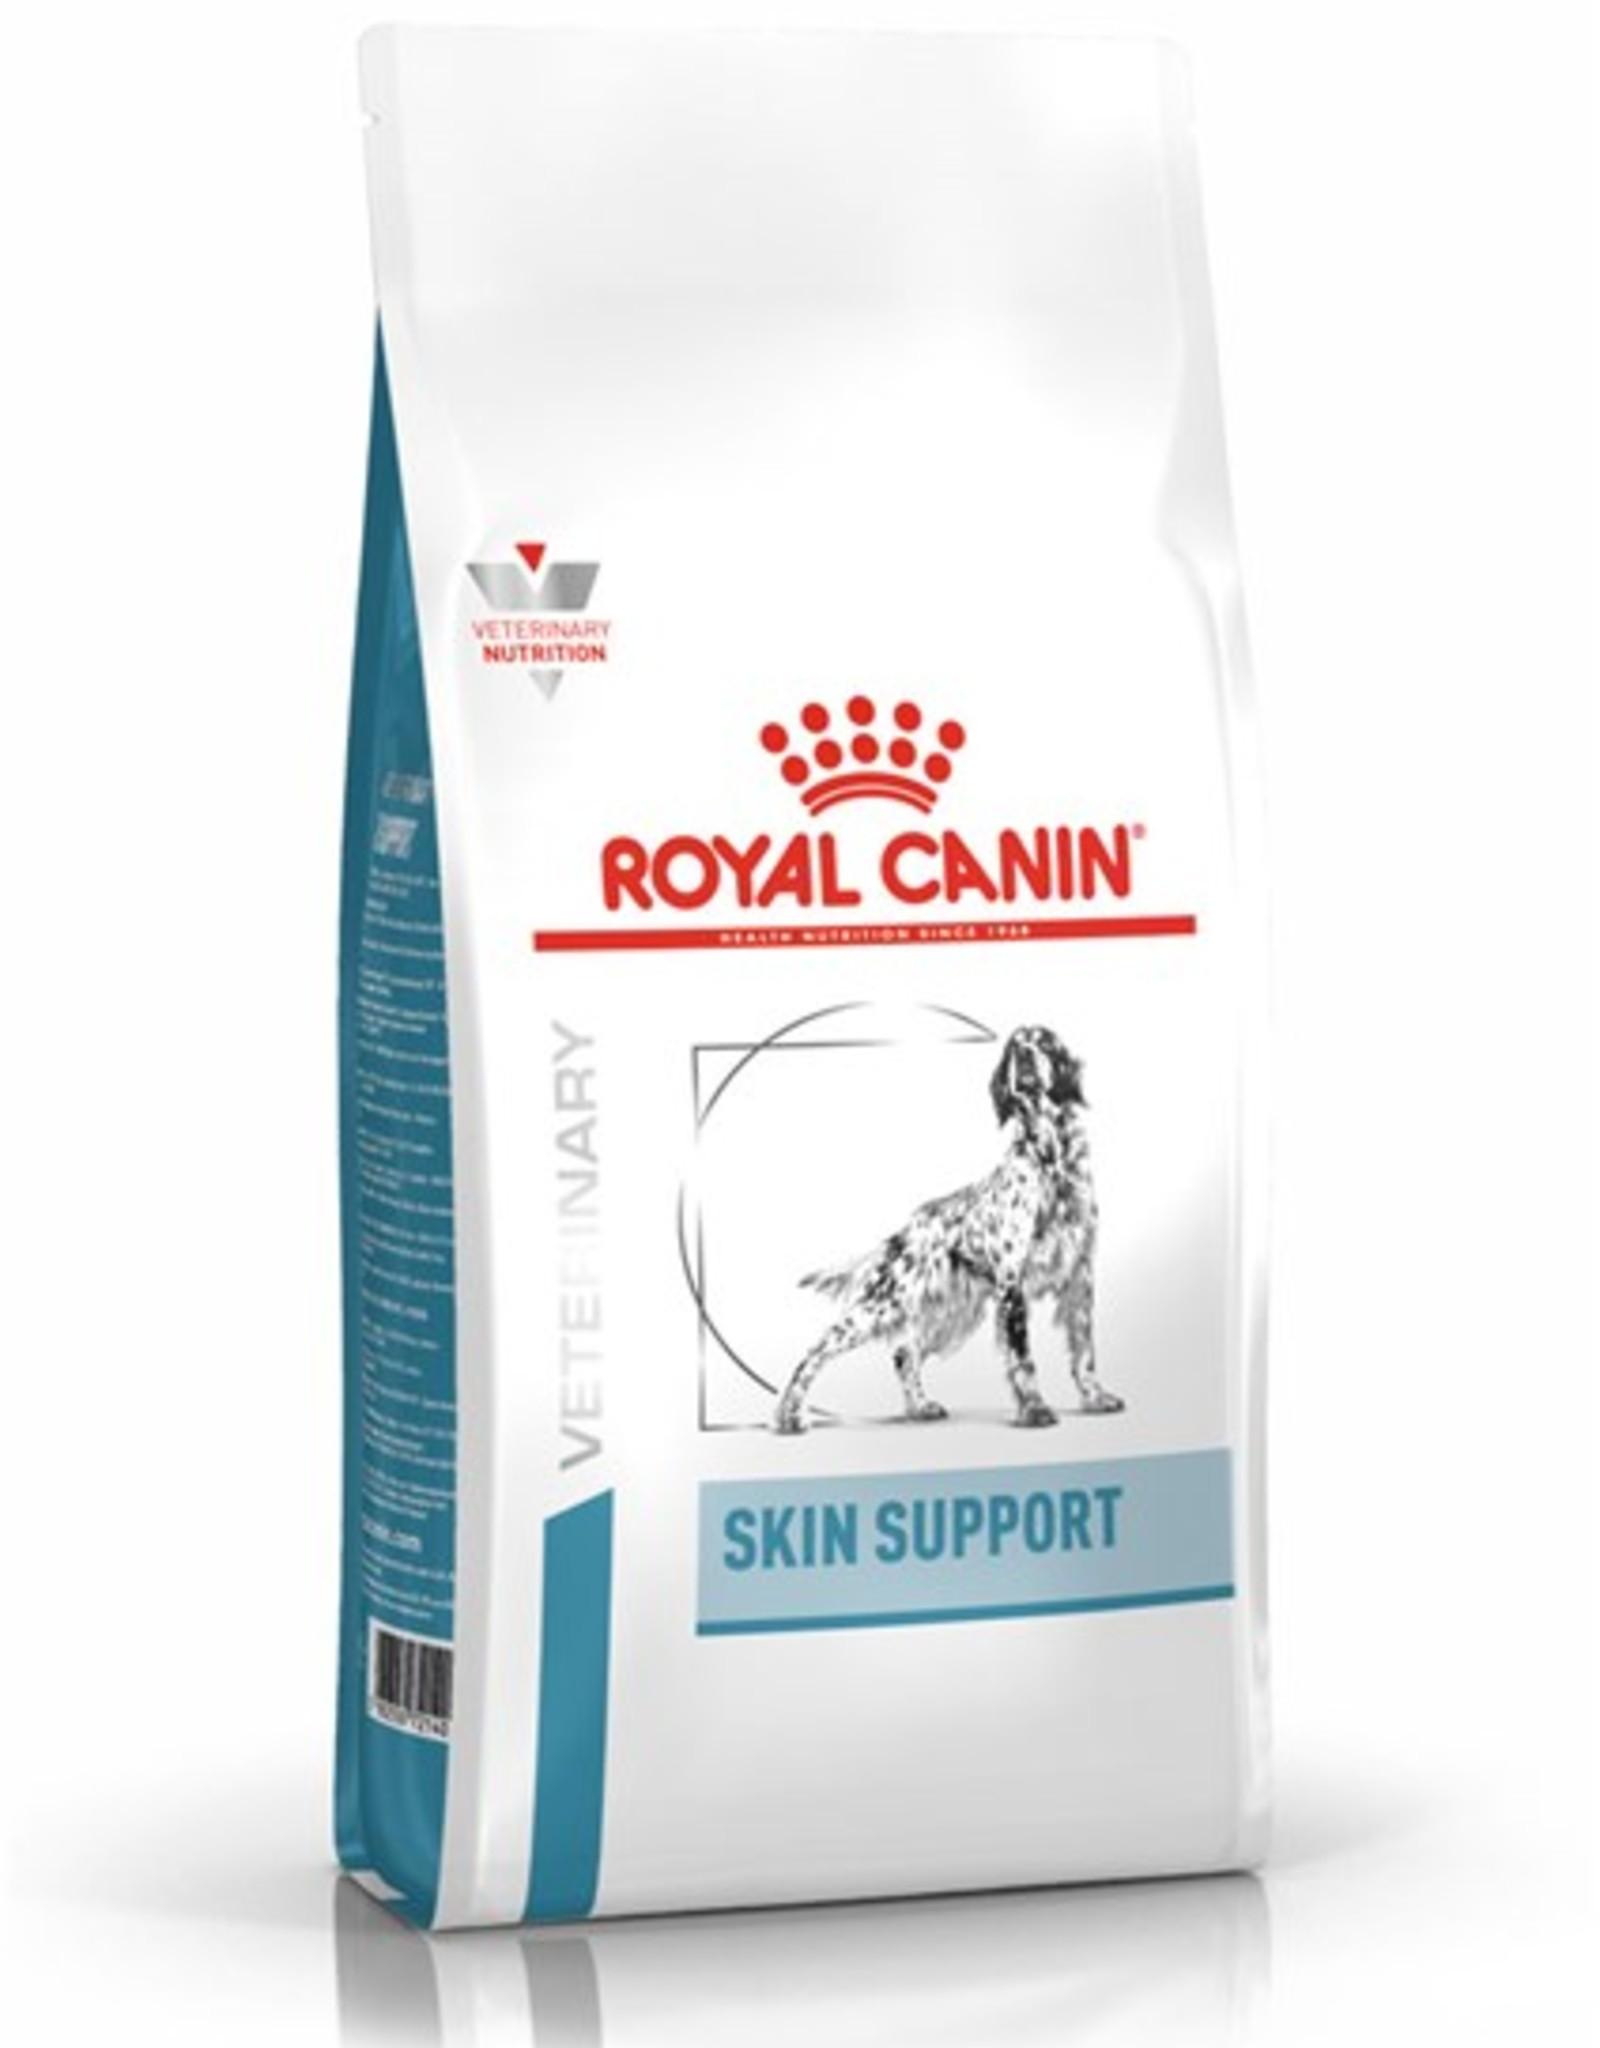 Royal Canin Royal Canin Skin Support Hond 7kg